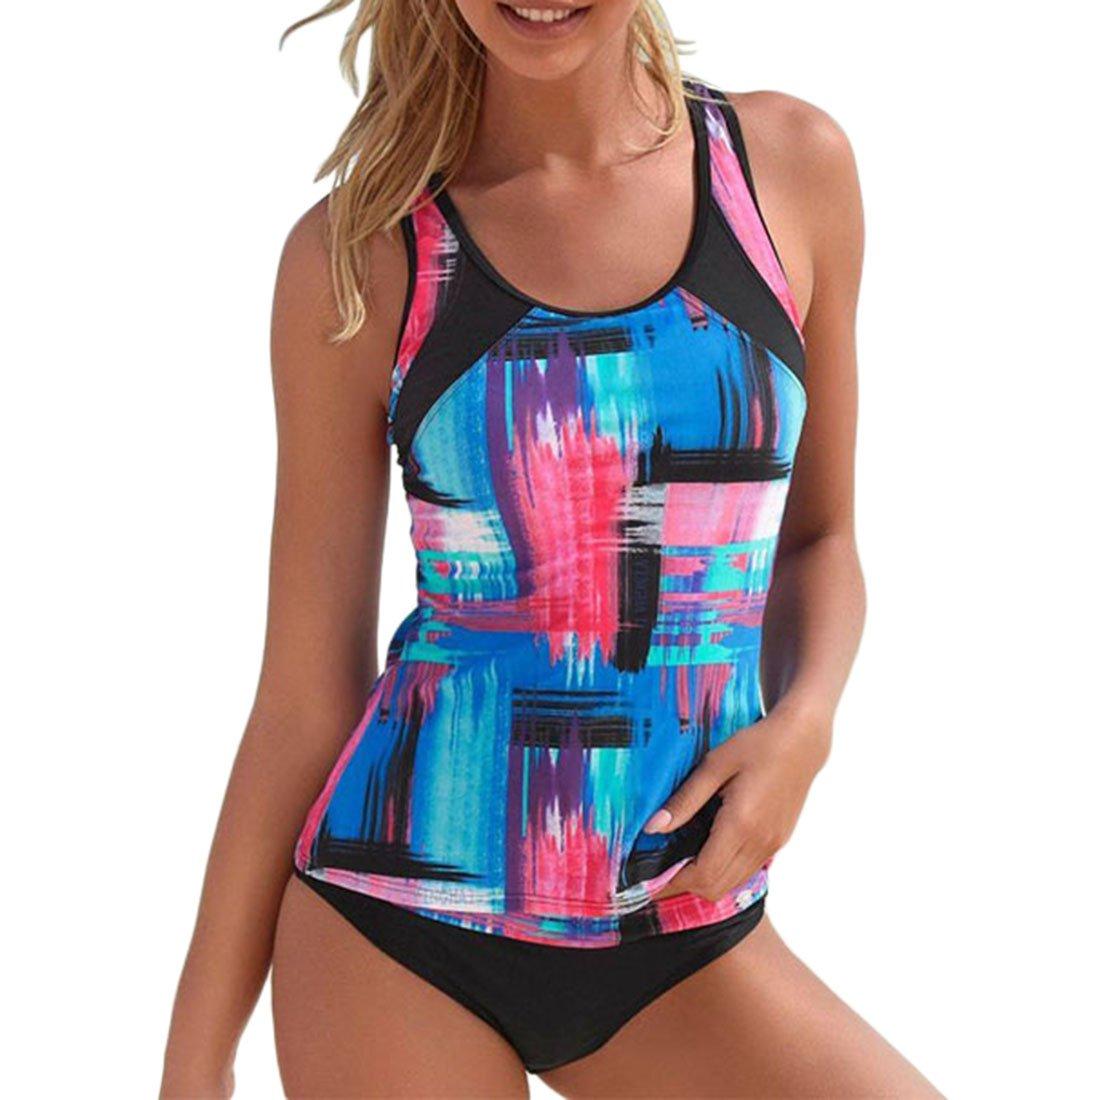 Shinekoo Damen Bademode Elegant Farbdruck Top + Slip Tankinis Bademode Große Größen Bikini-Sets